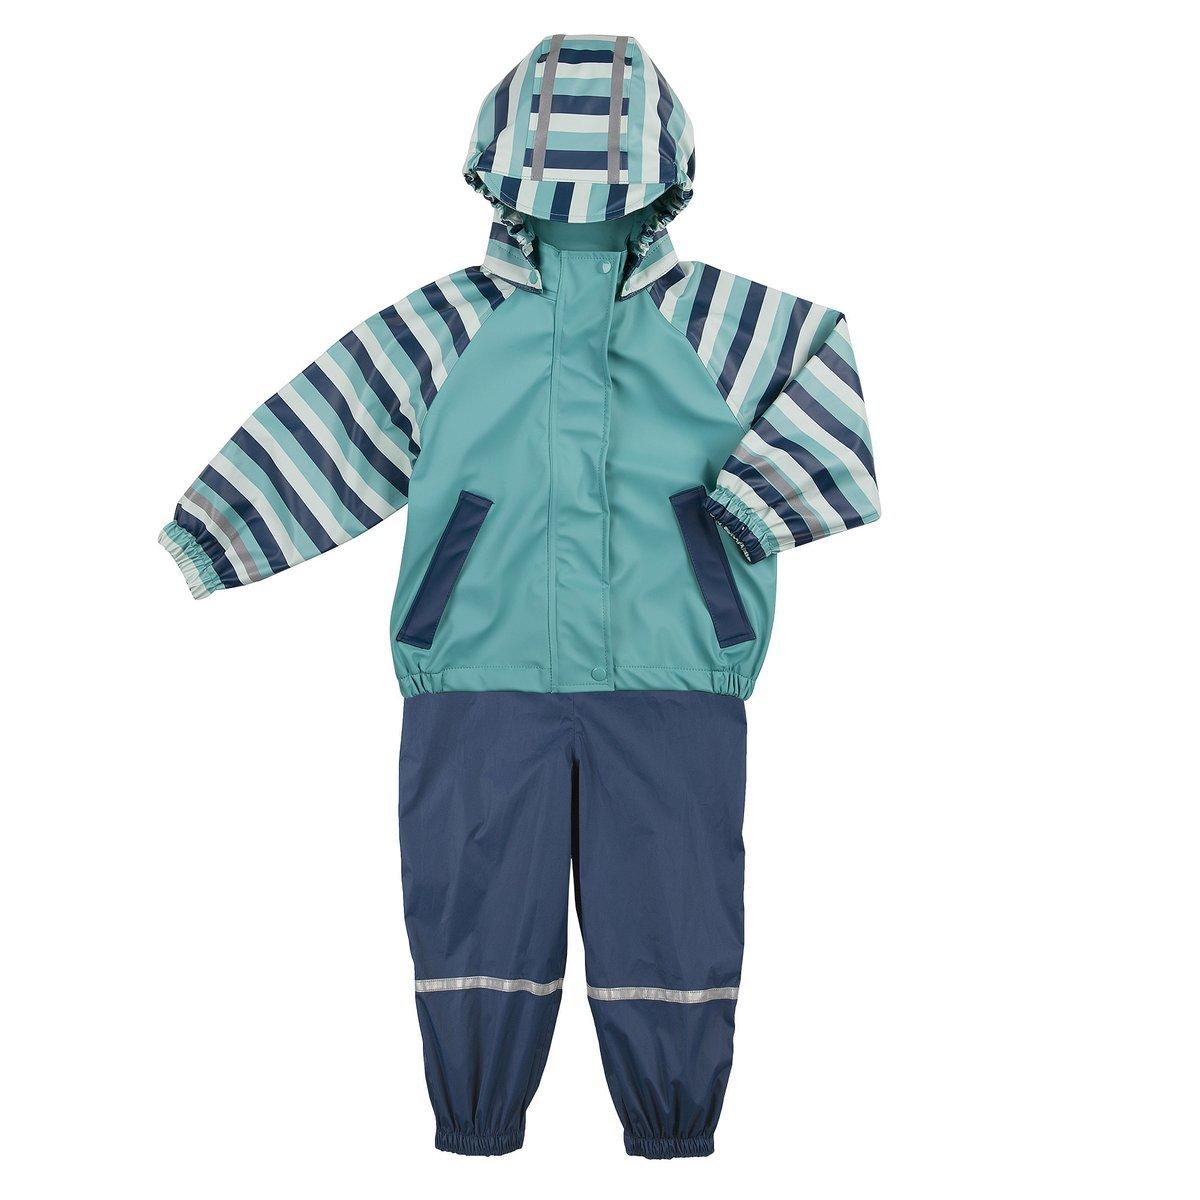 Dandelion Fr/ühchen J/äckchen Jacke Mantel Baby Bekleidung Teddy 32-50cm Blau Rosa Wei/ß